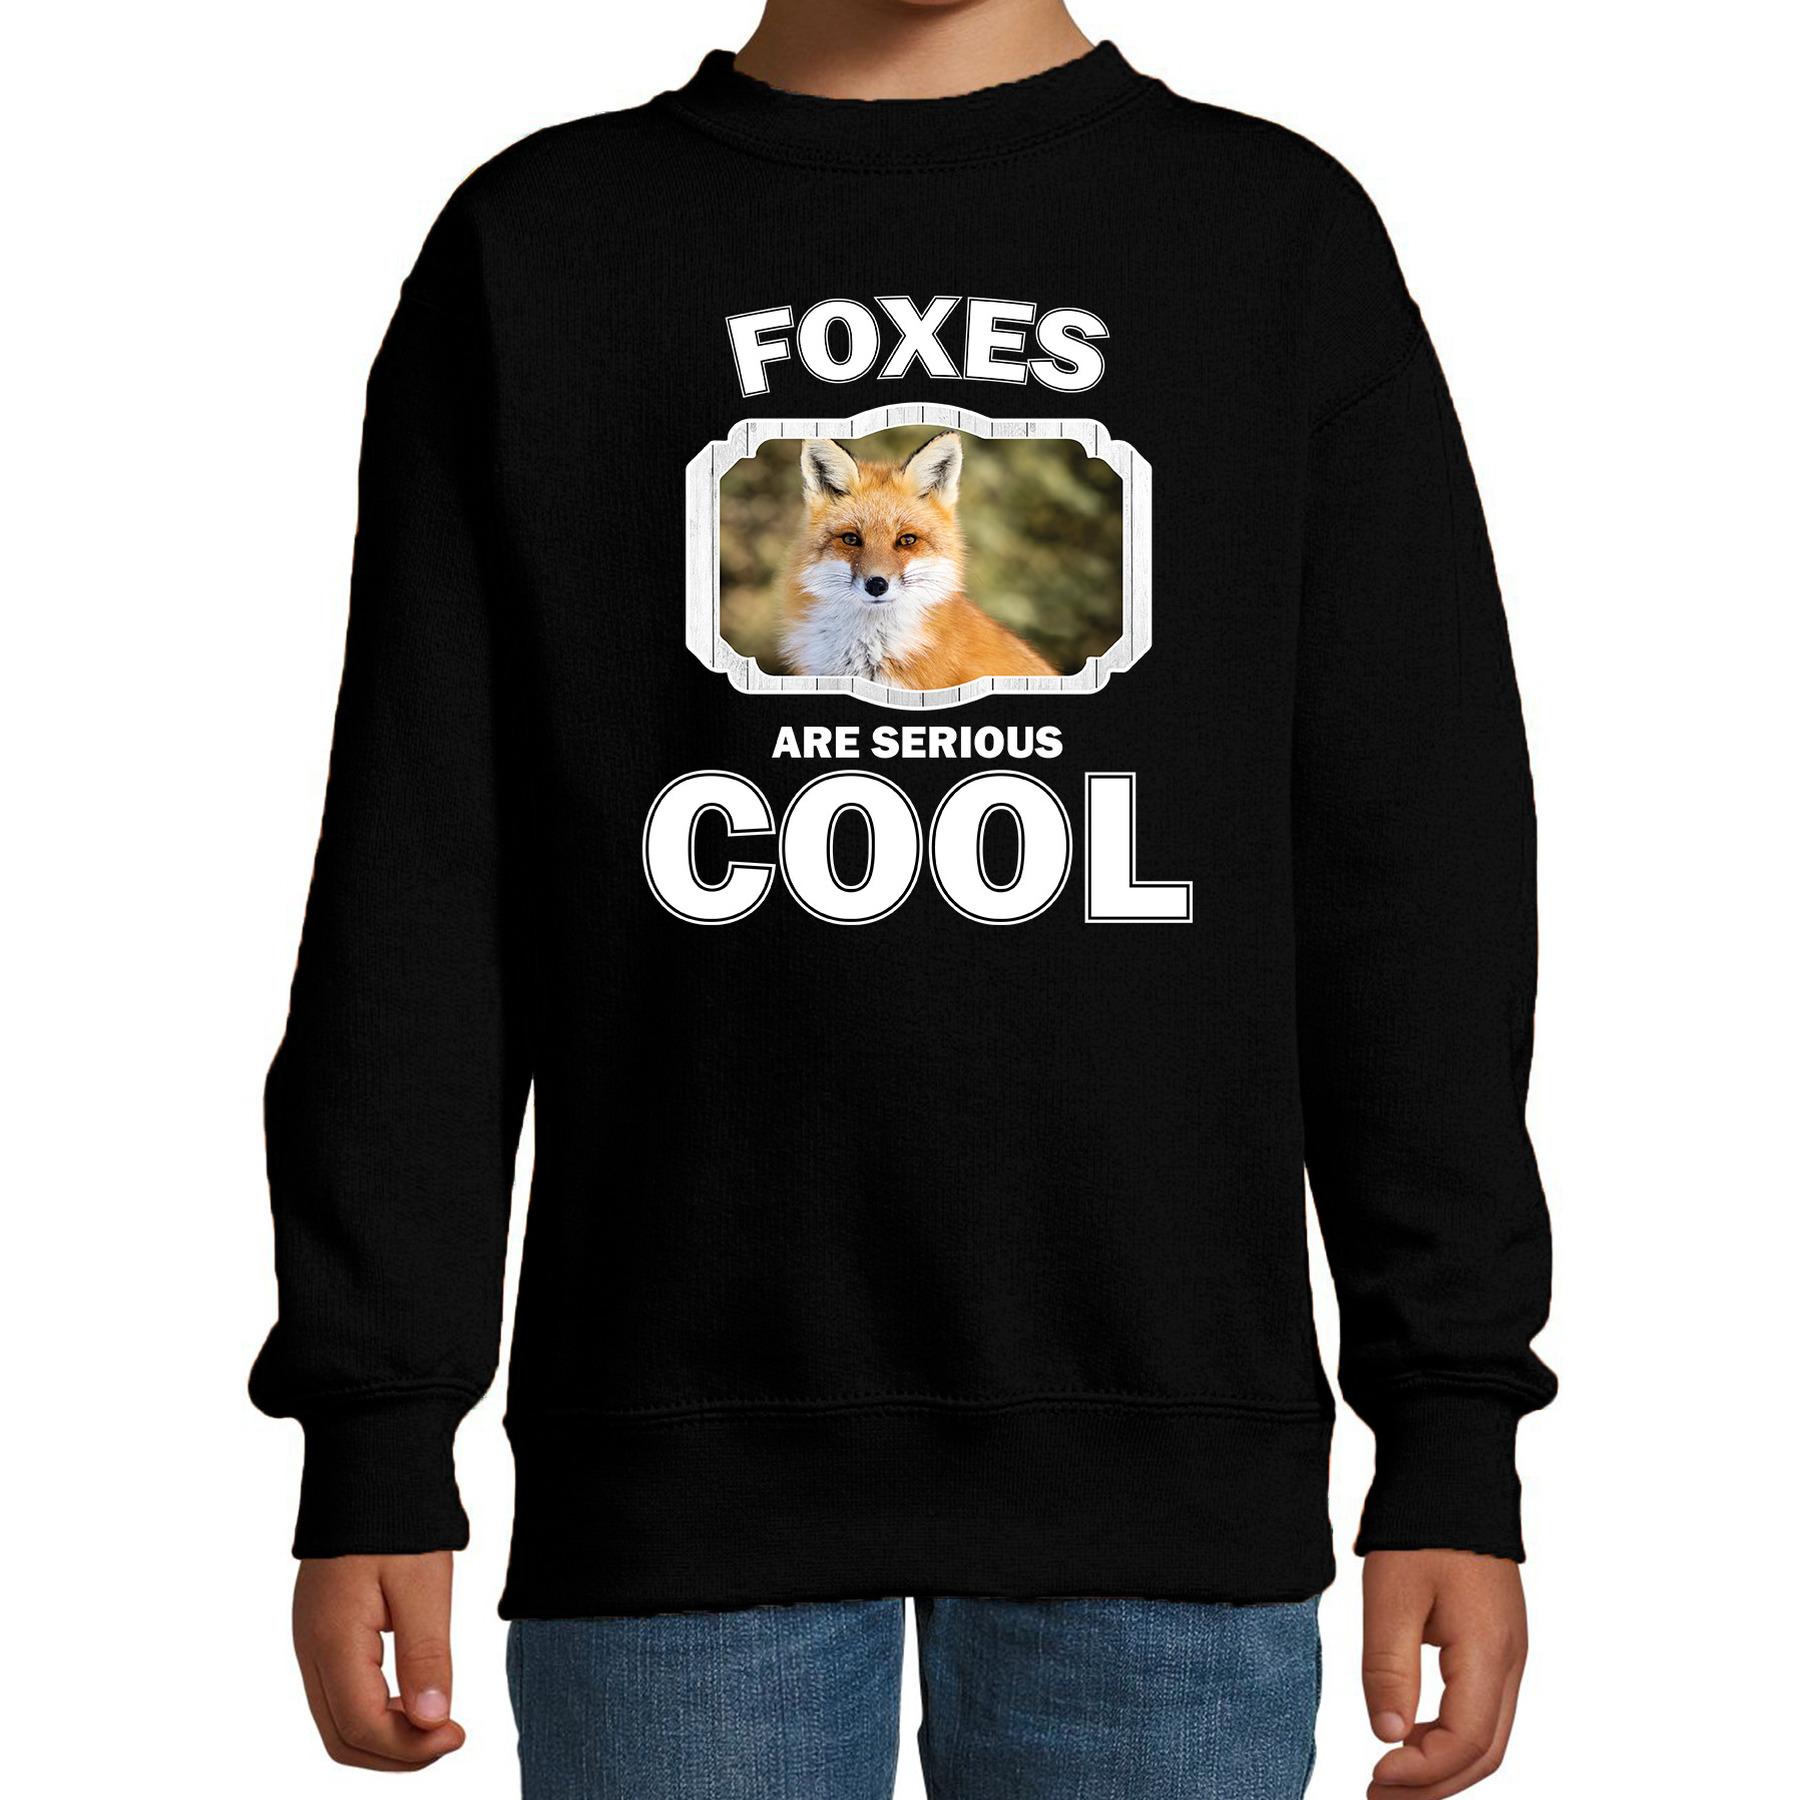 Sweater foxes are serious cool zwart kinderen - vossen/ vos trui